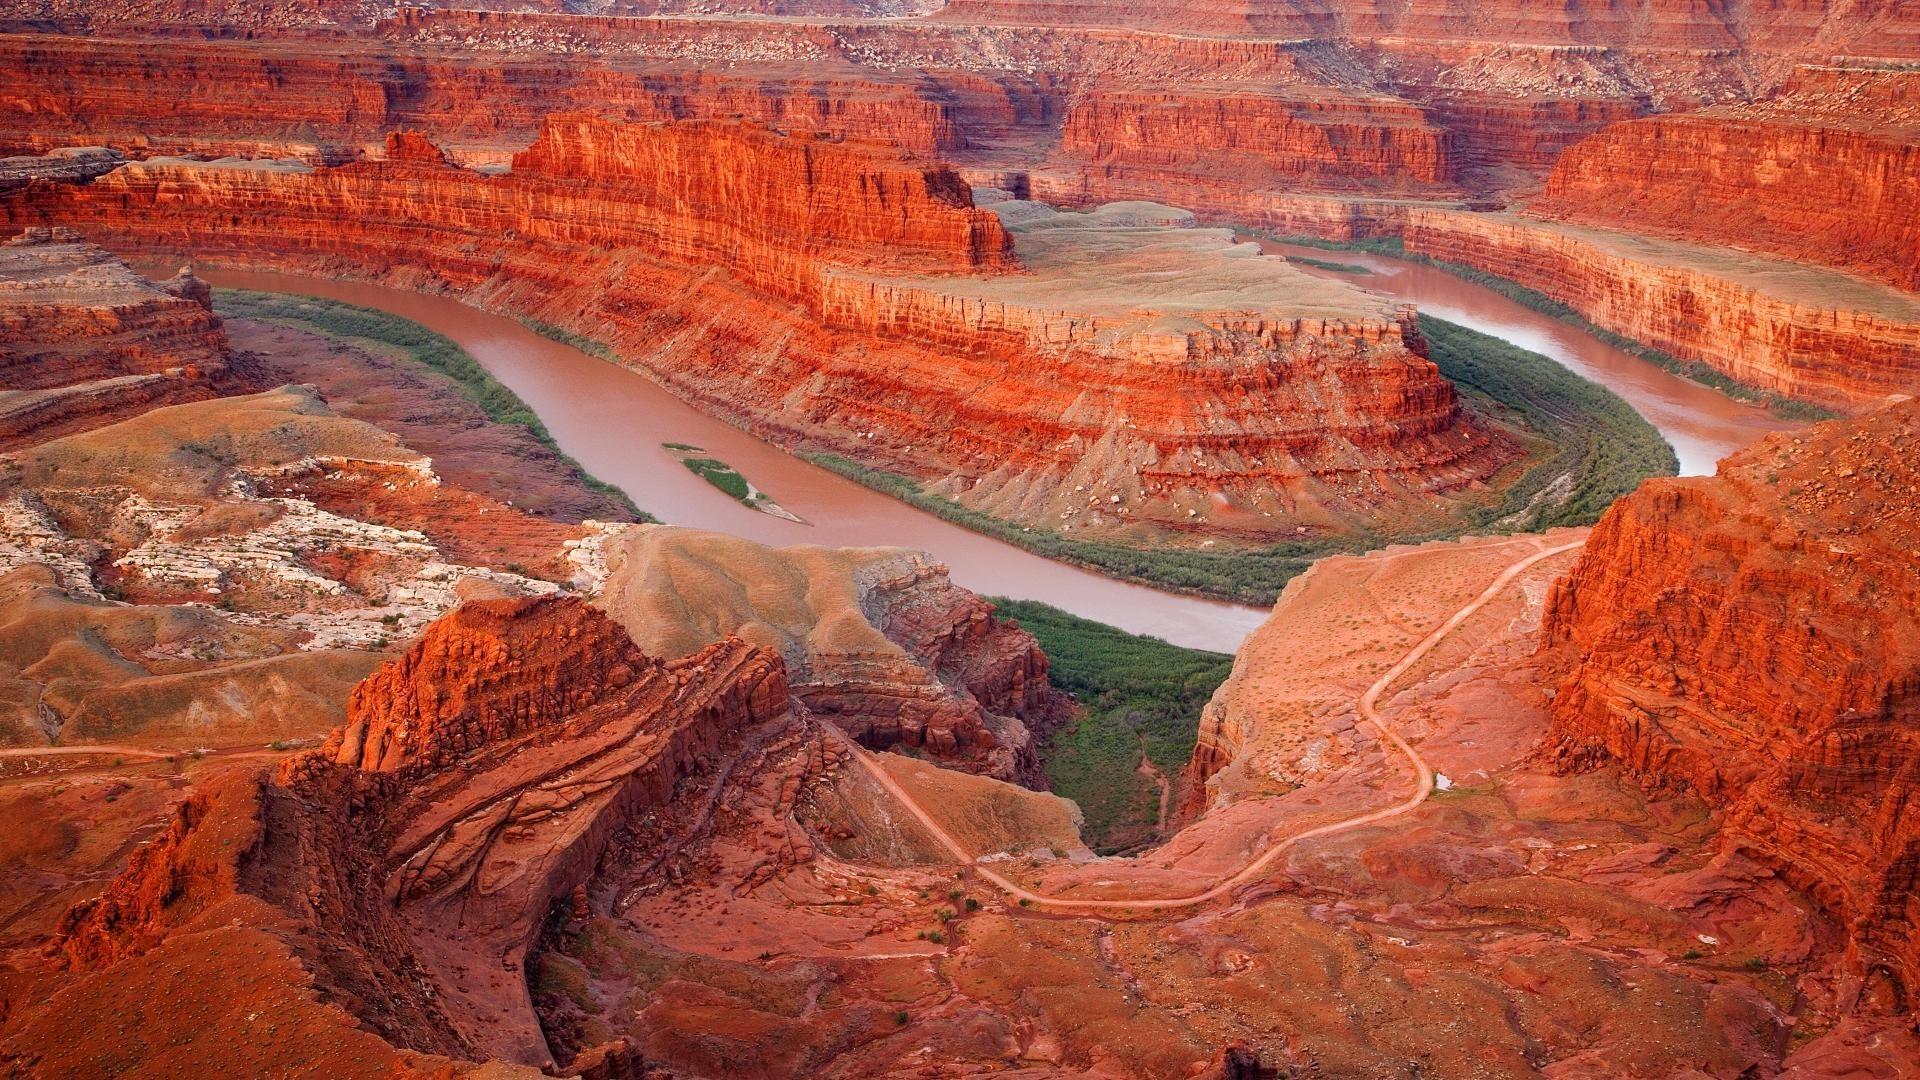 Desert – Canyon Bend Dessert Usa Arizona Utha Great Places HDR Wallpaper  for HD 16: